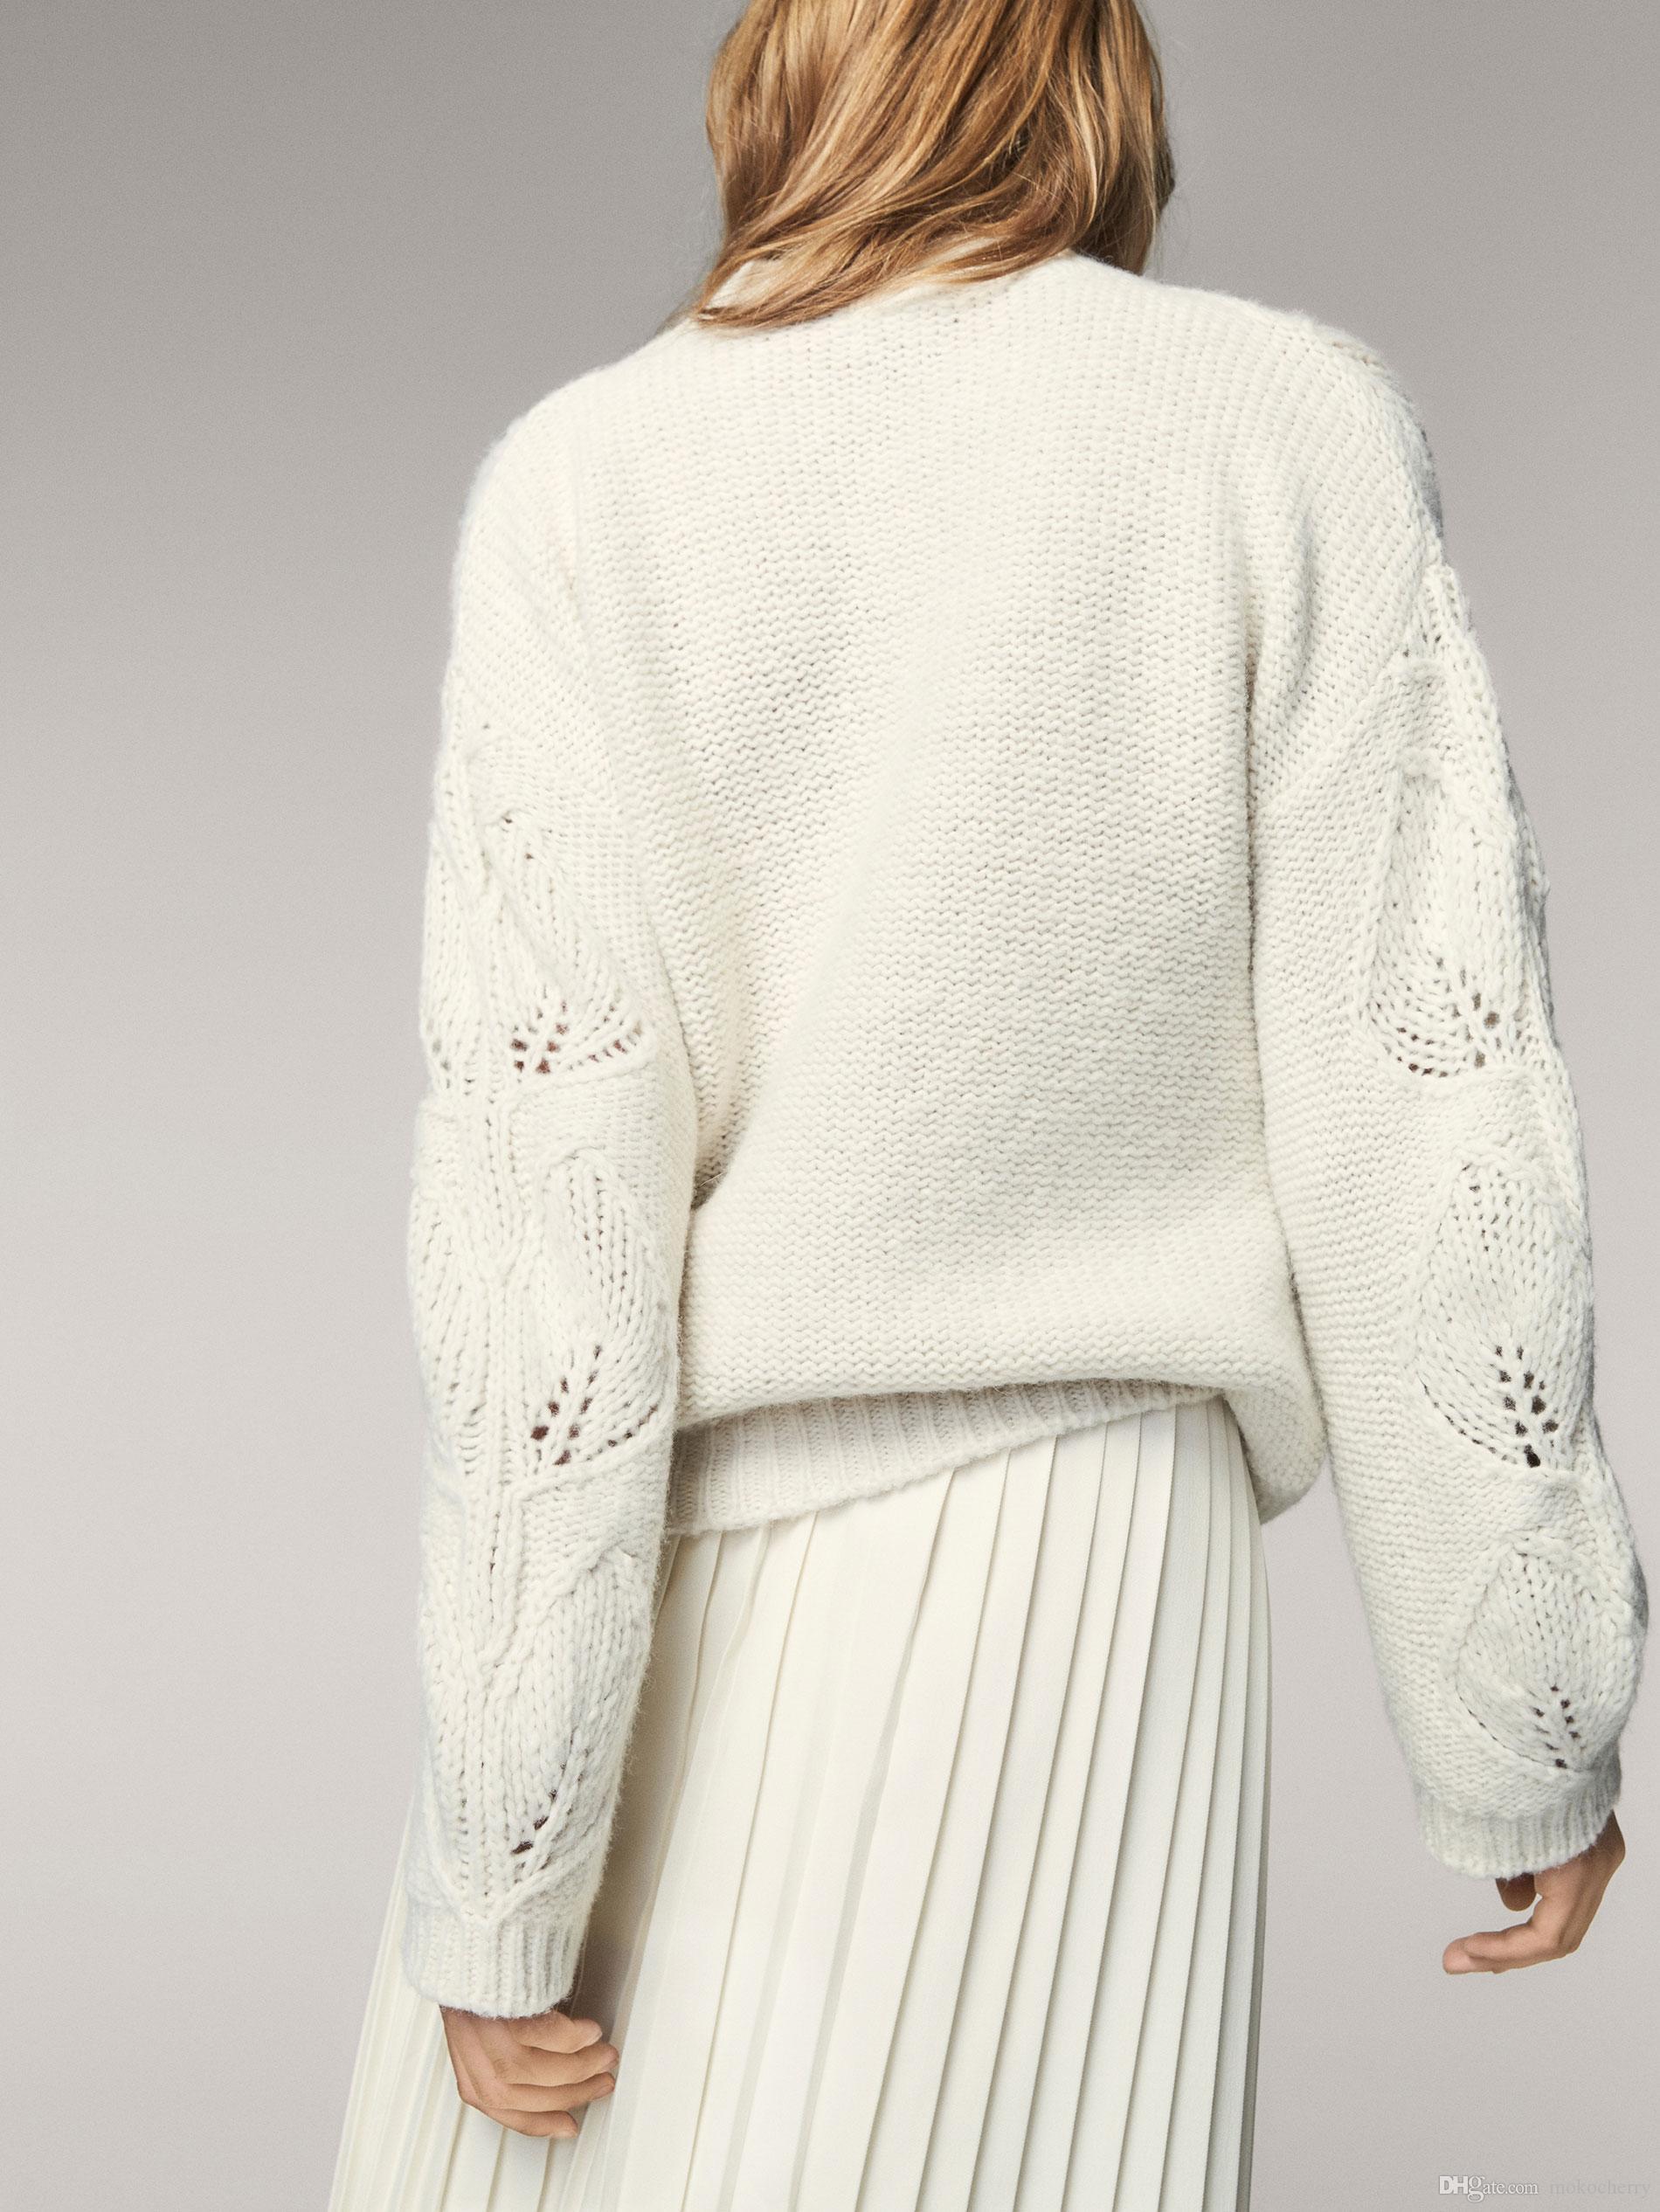 2019 Womens White Hollow Design Sweater Massimo Dutti Brand New